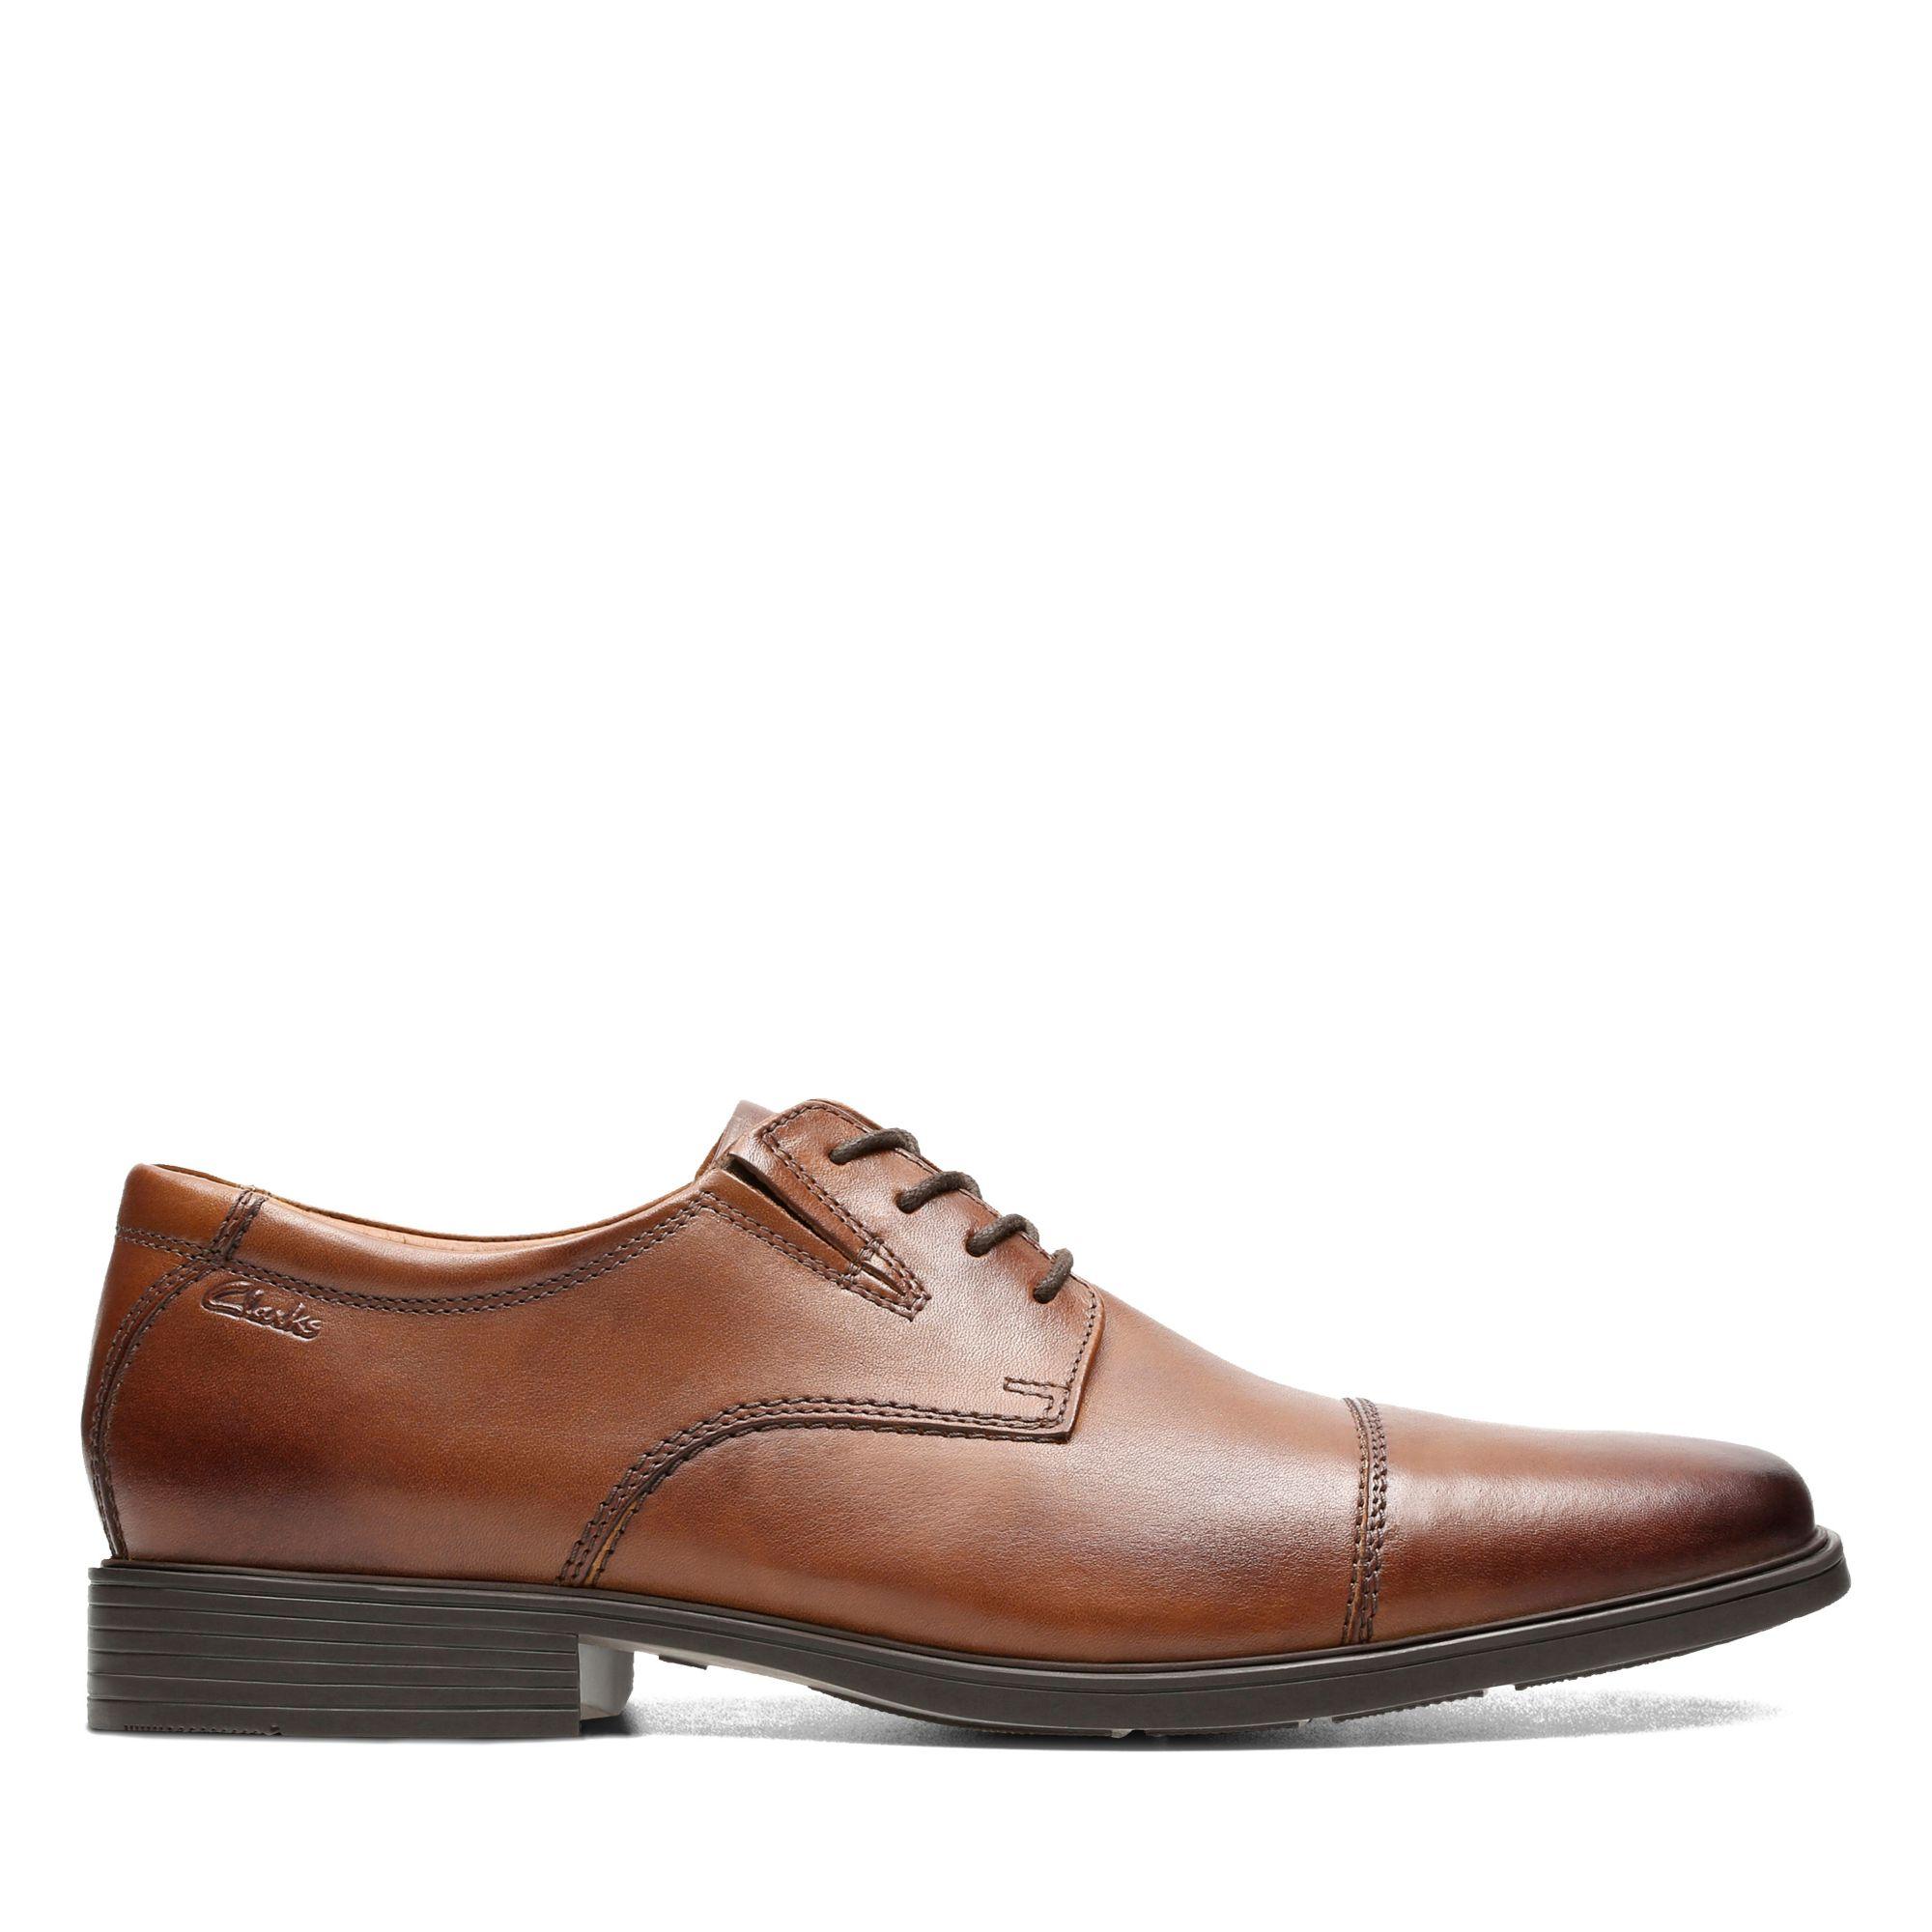 Clarks Tilden Cap – Leather